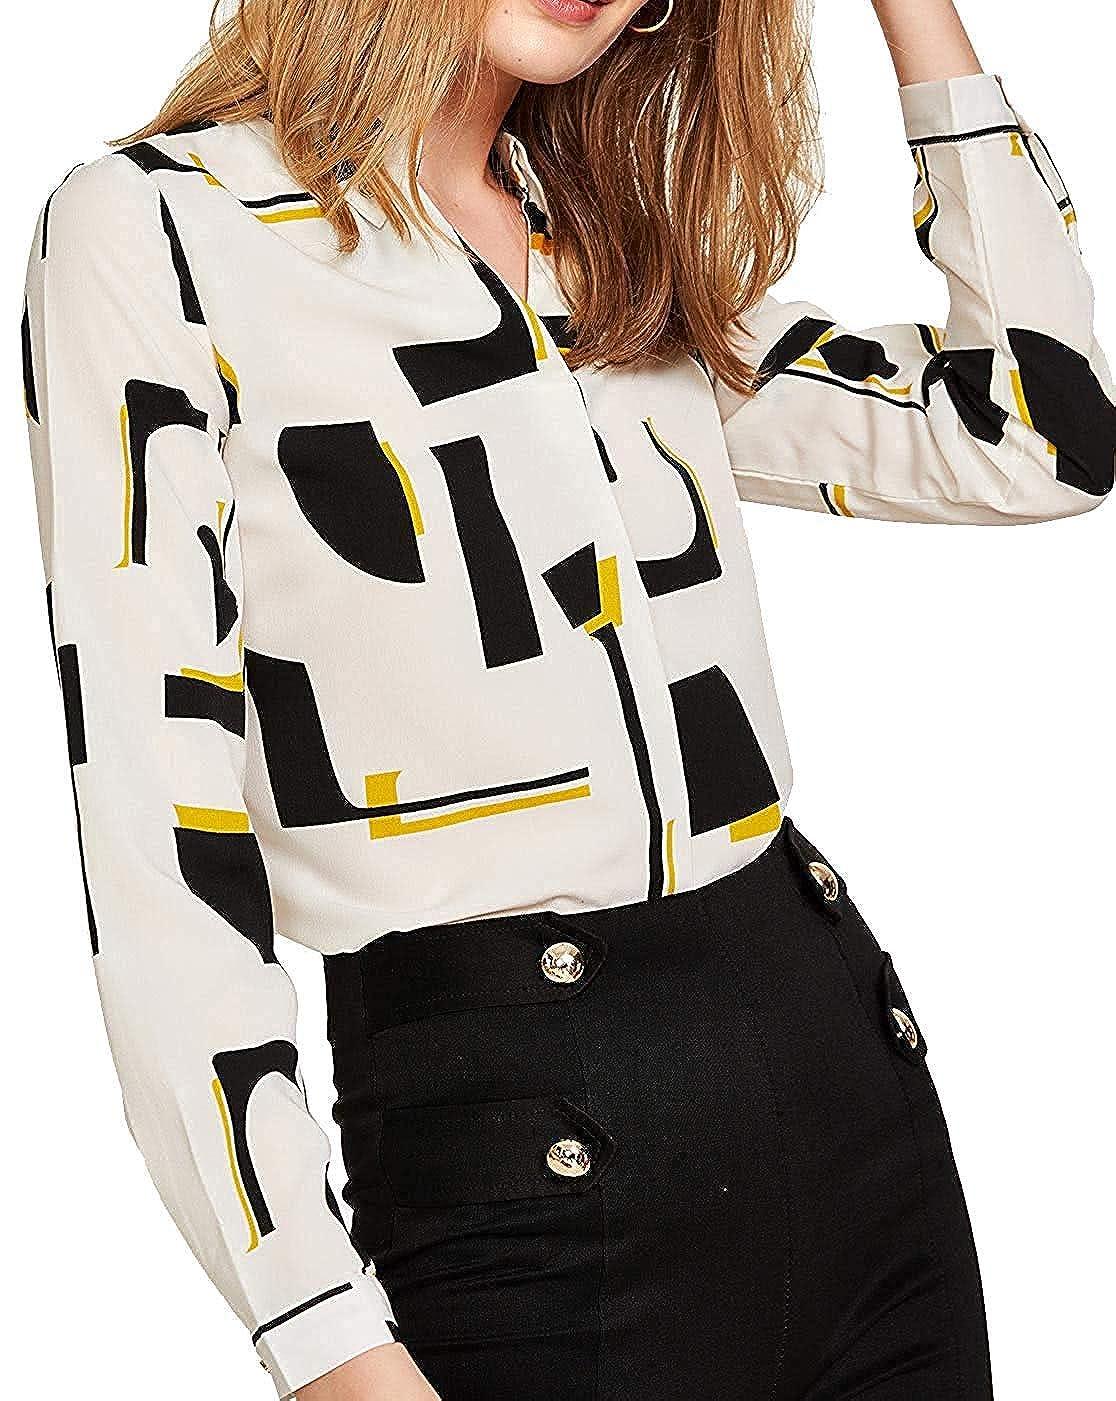 White2 Milumia Women's Contrast Stripe color Block Knit Top Long Sleeve TShirt